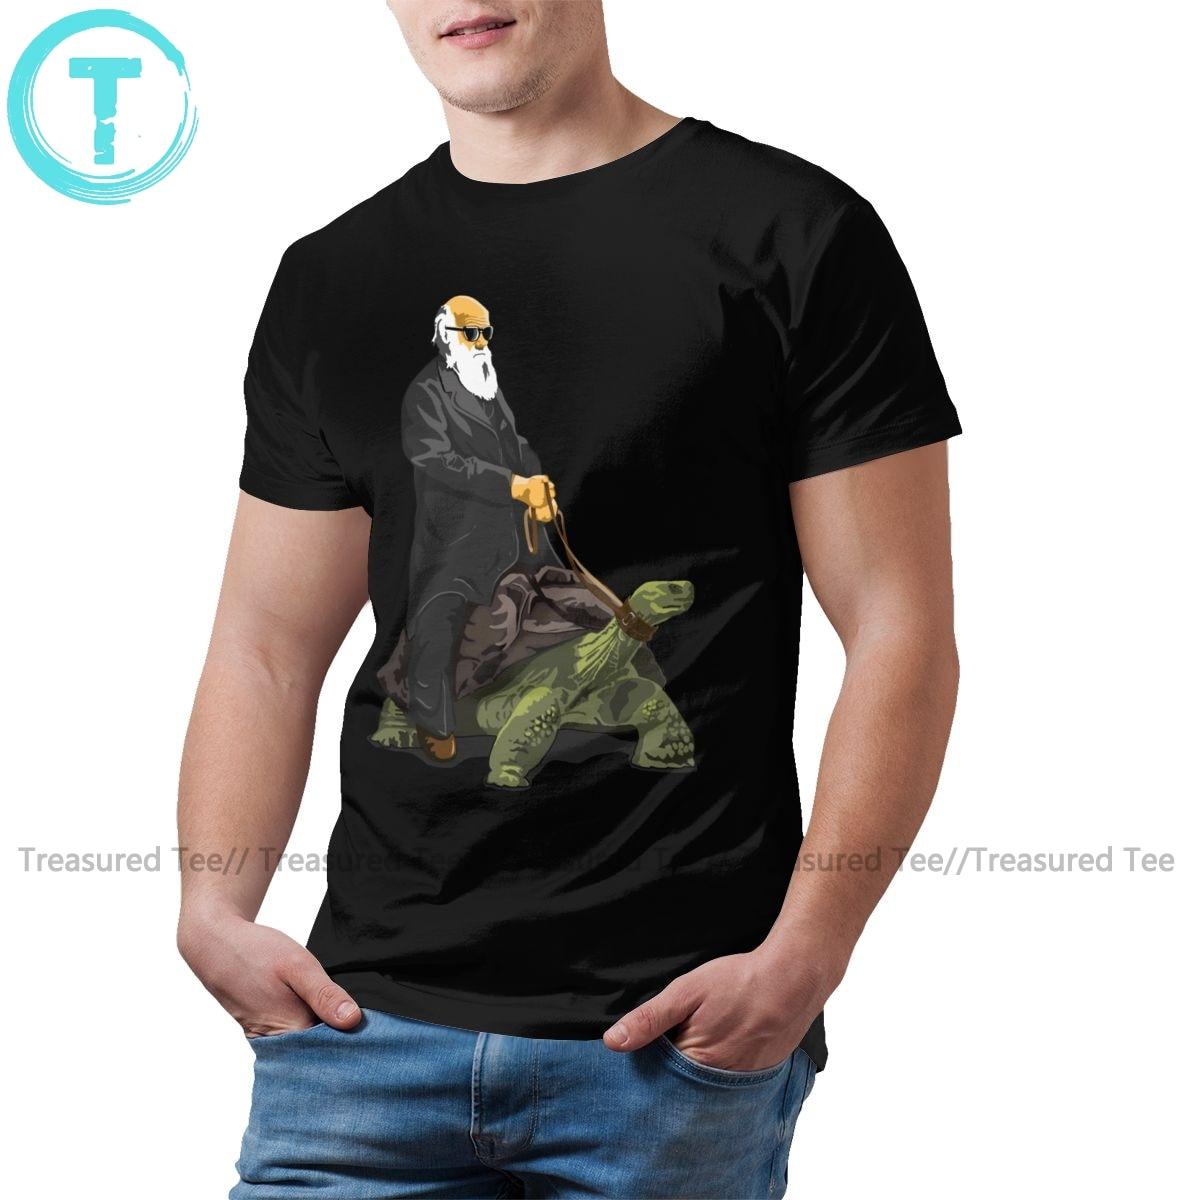 Camiseta de tortuga, camiseta de estilo Galápagos, camiseta grande para hombre, camiseta de manga corta informal divertida, Camiseta de algodón 100 por ciento